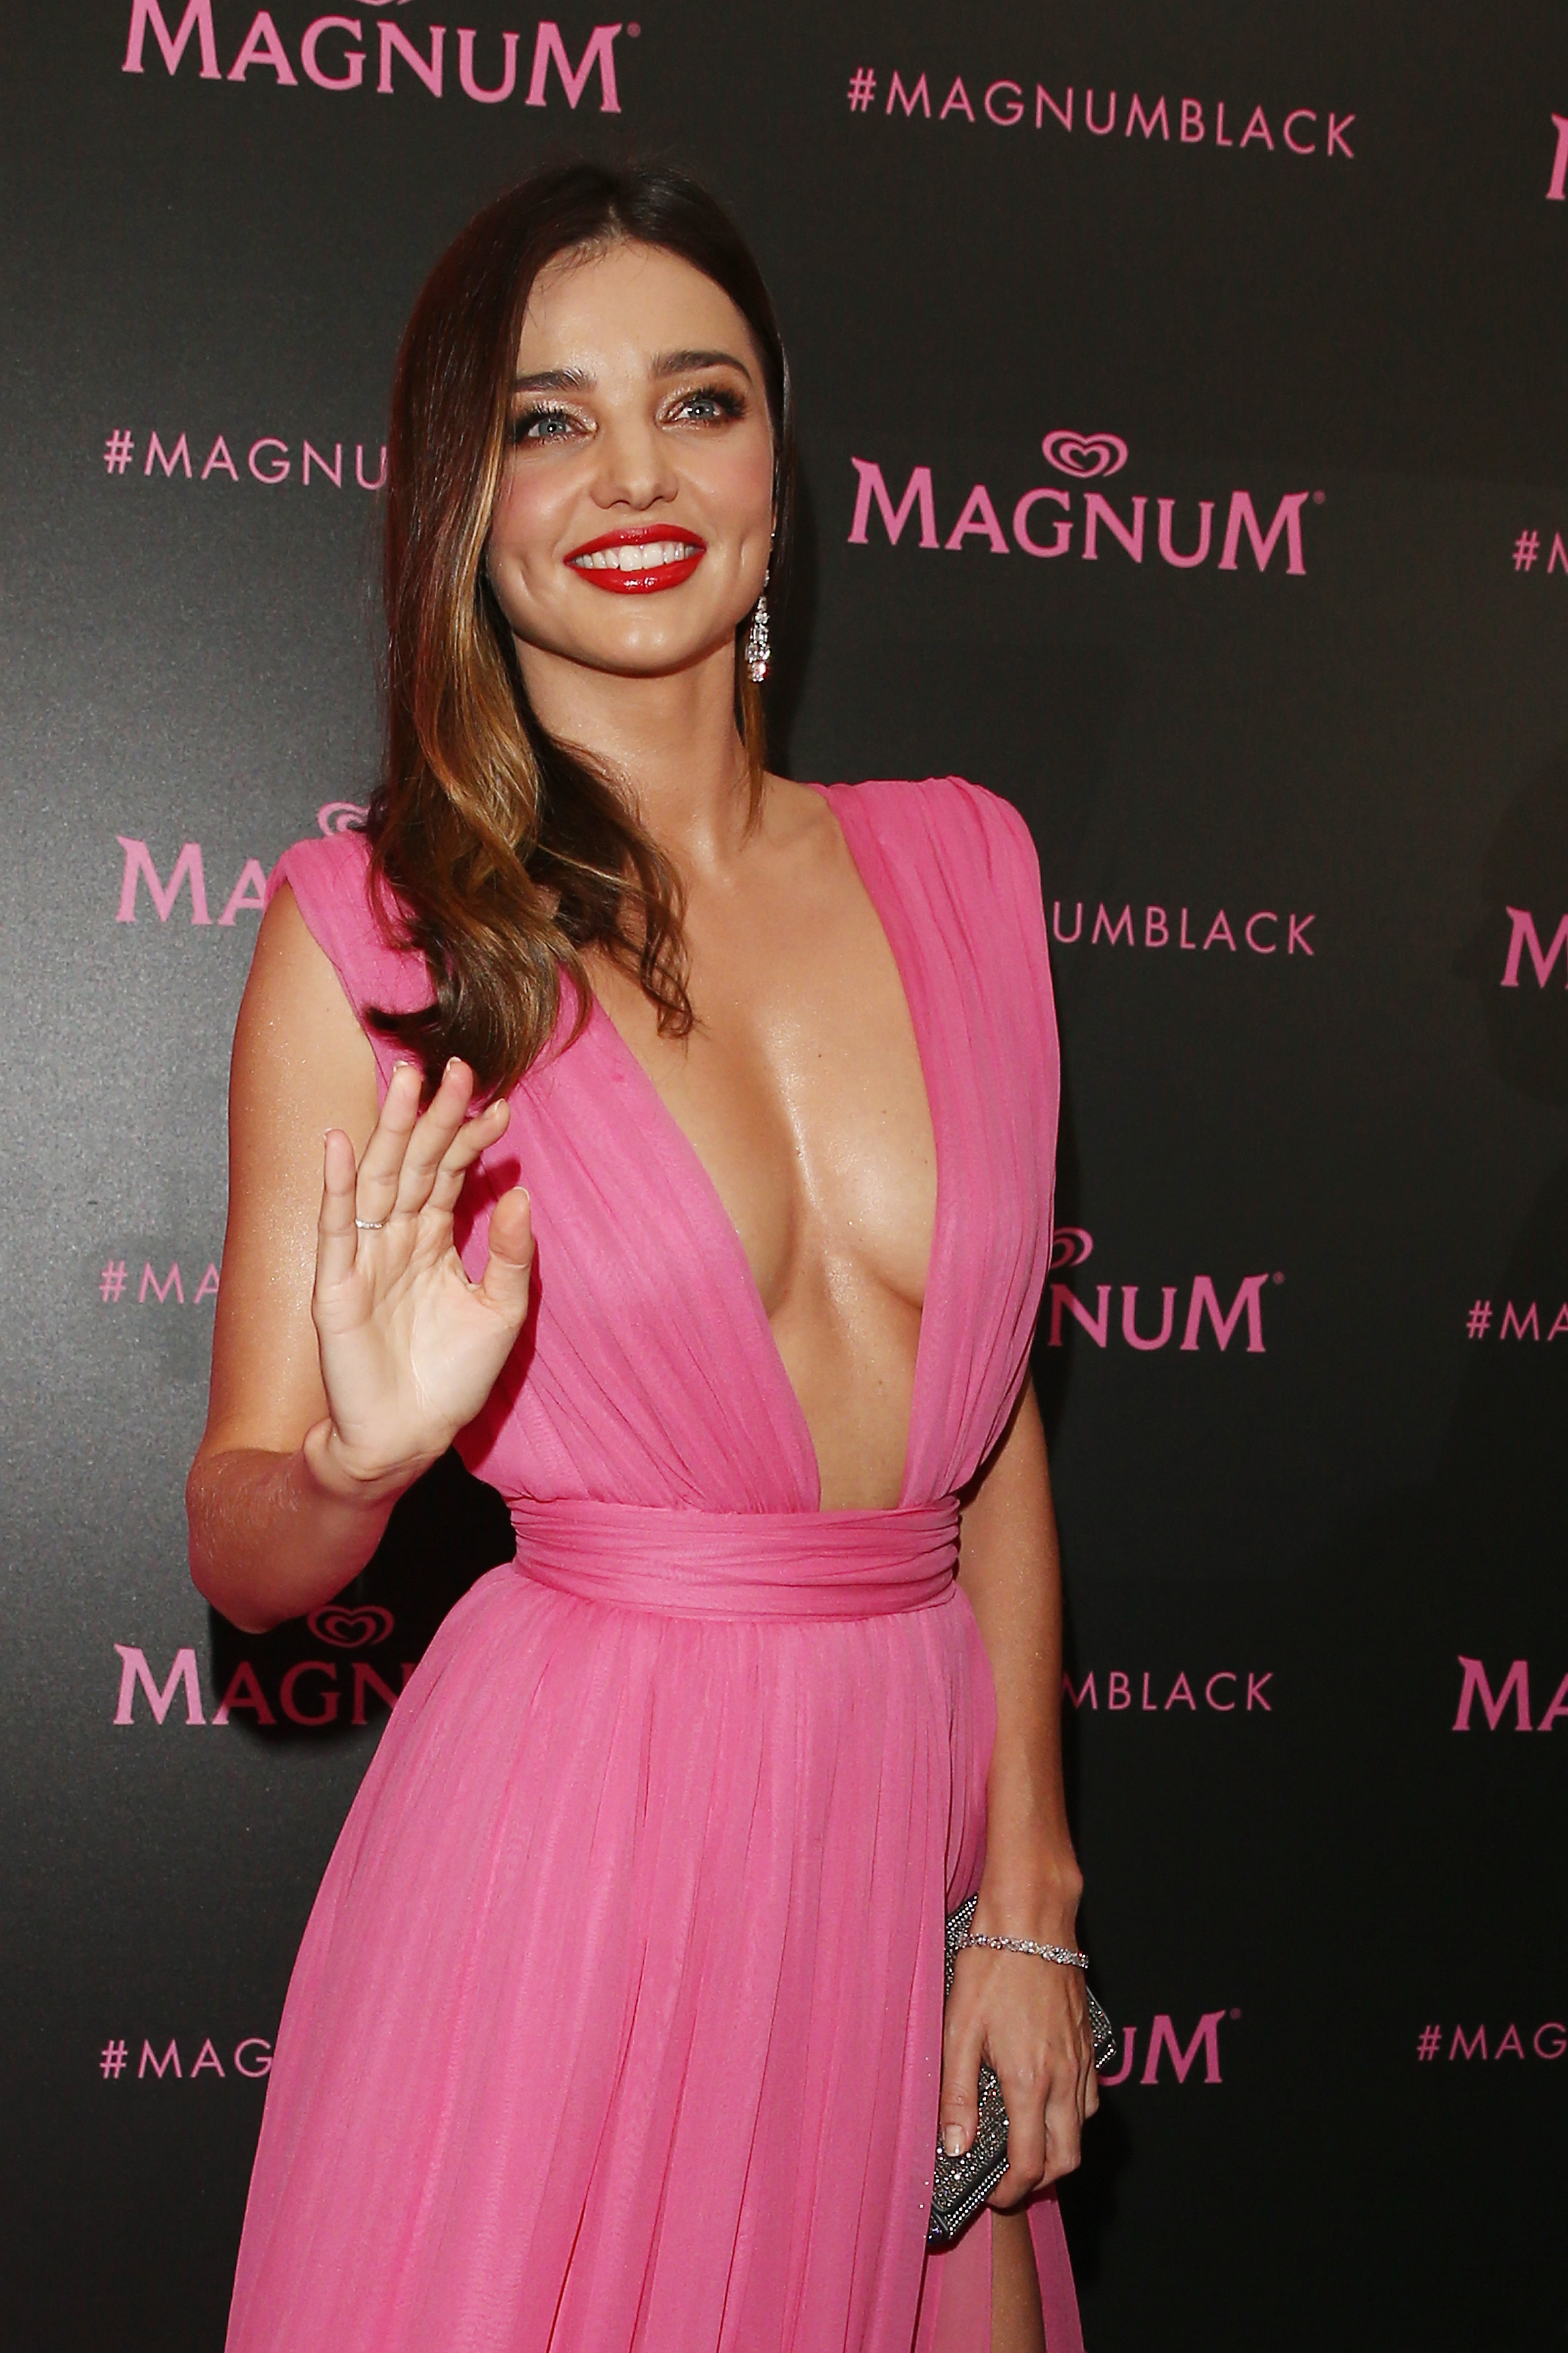 Boobs Miranda Kerr nudes (29 photos), Pussy, Sideboobs, Instagram, cleavage 2019